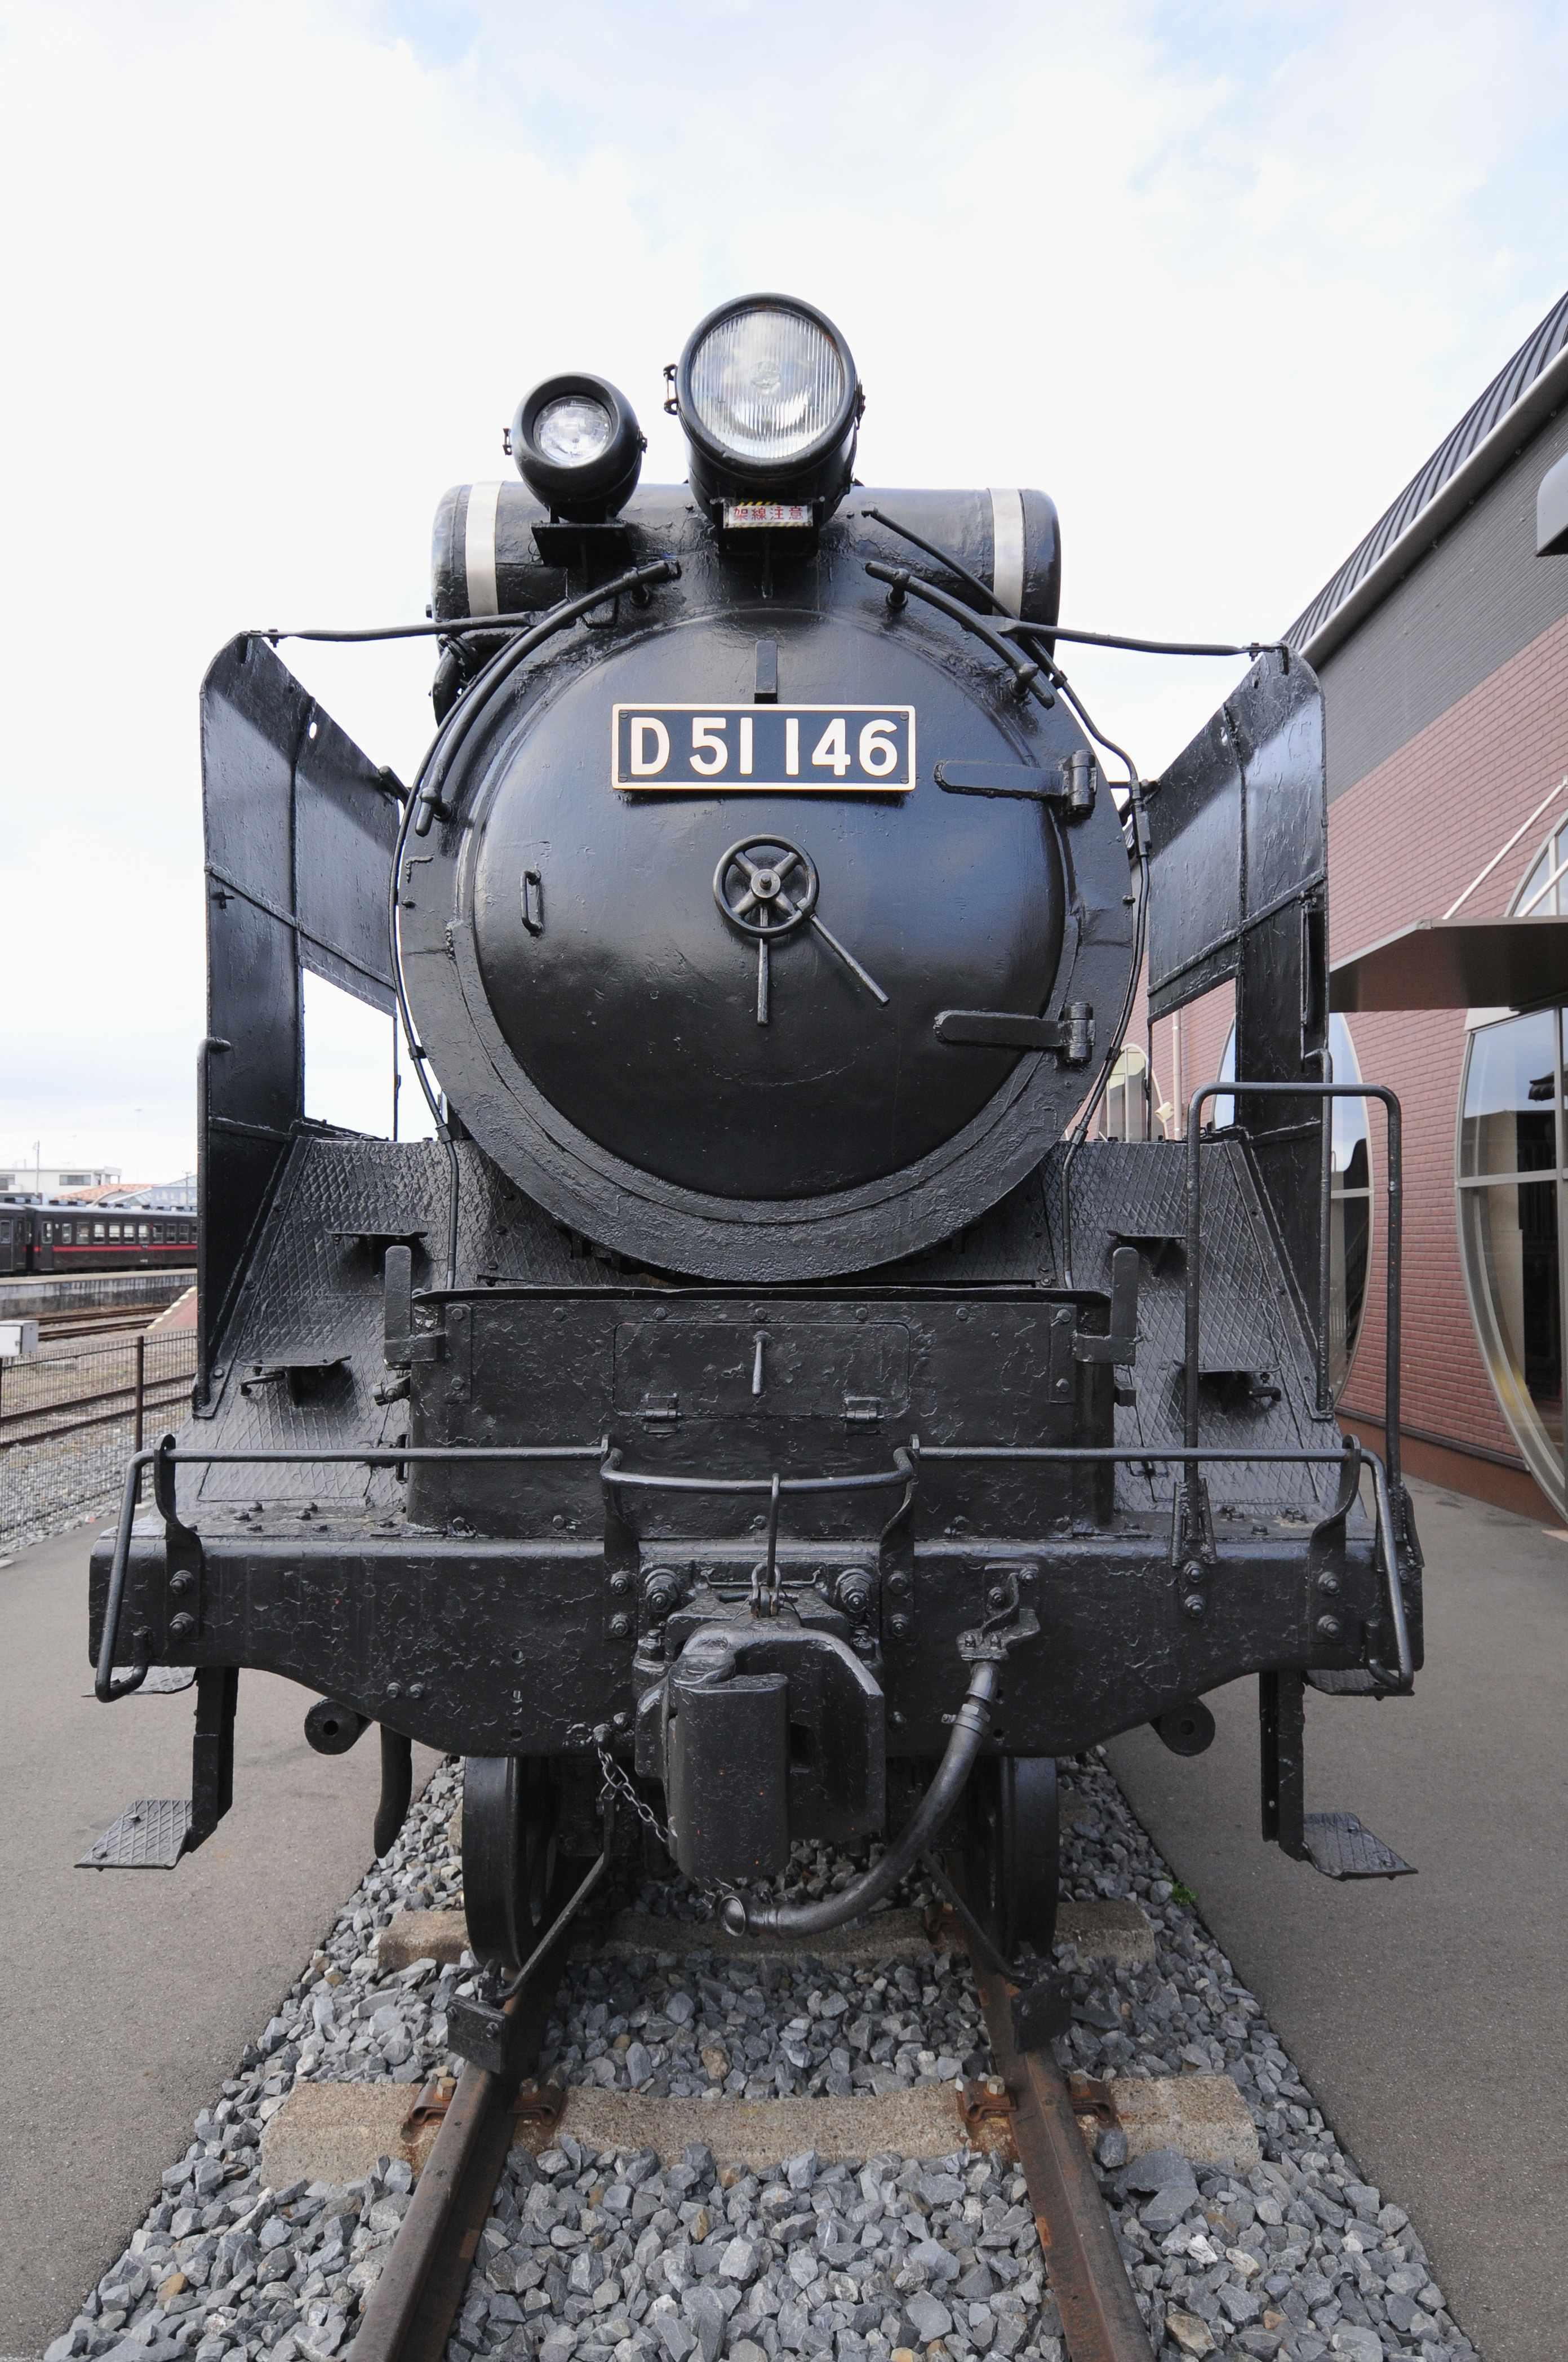 DSC_6632-1.jpg